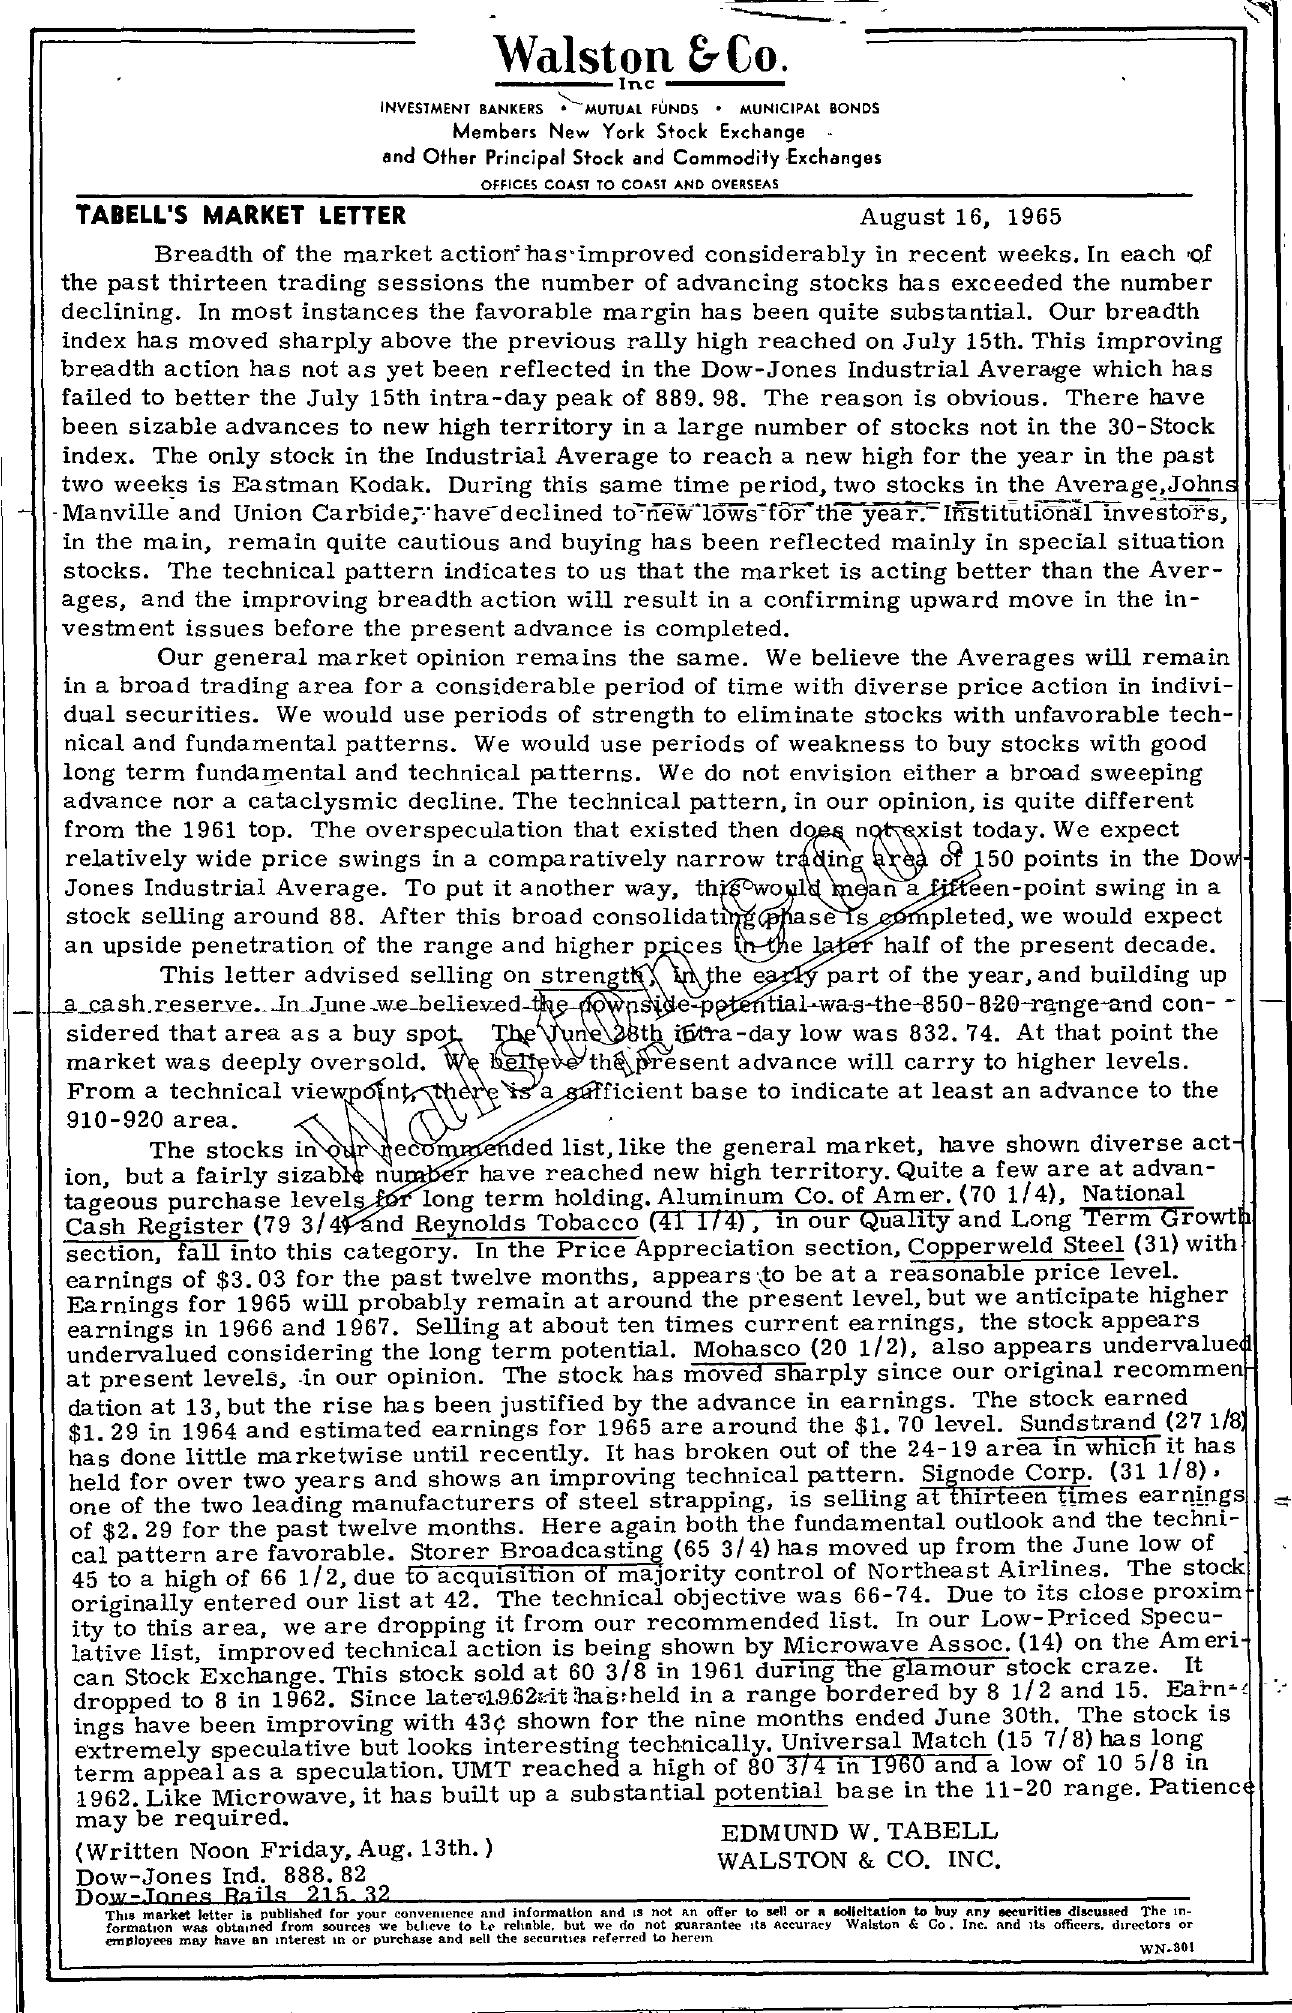 Tabell's Market Letter - August 16, 1965